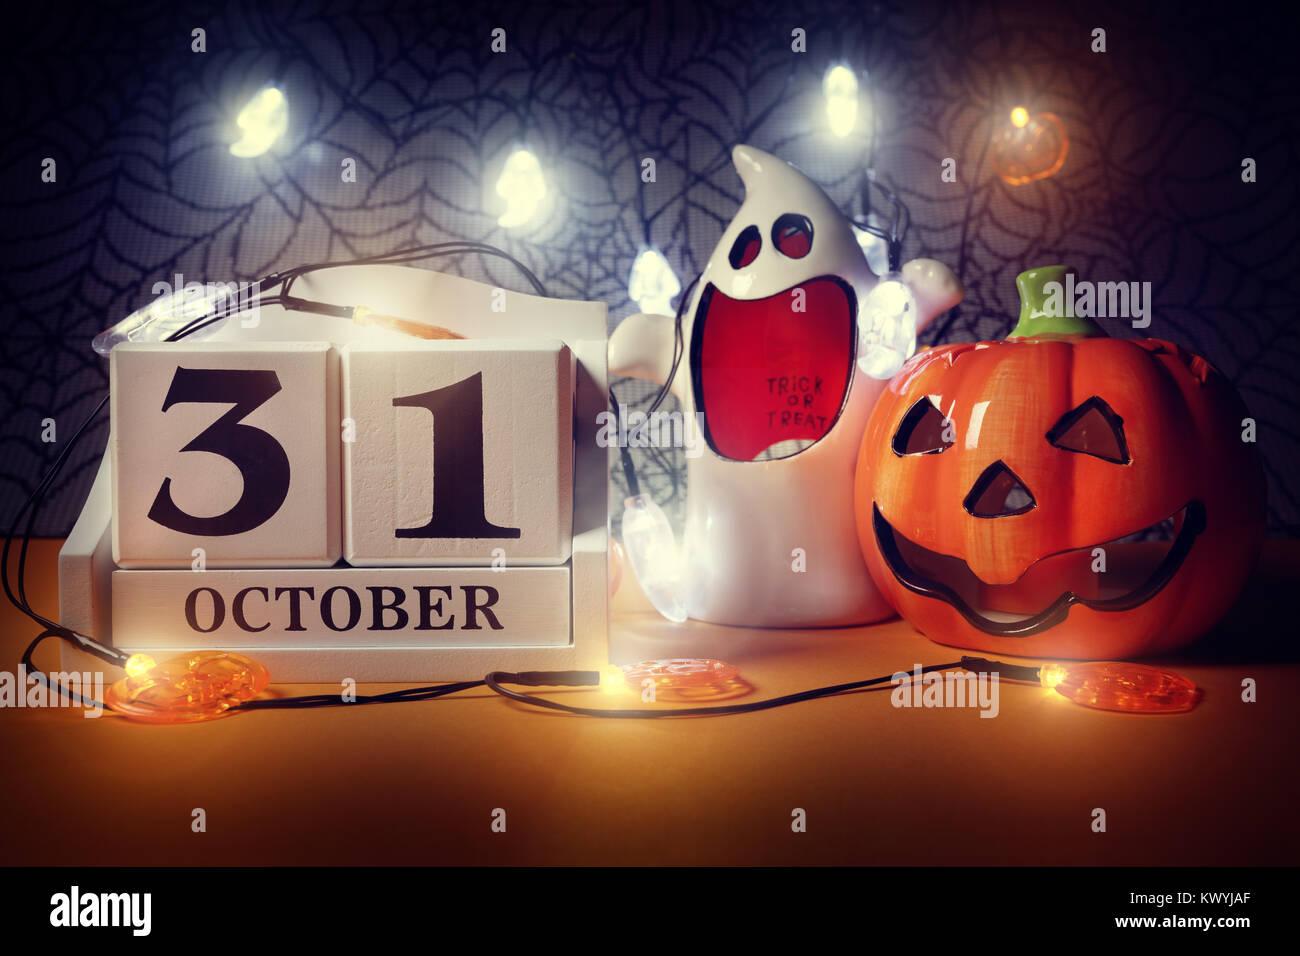 Halloween Calendar Date 31st October With Pumpkin And Ghost